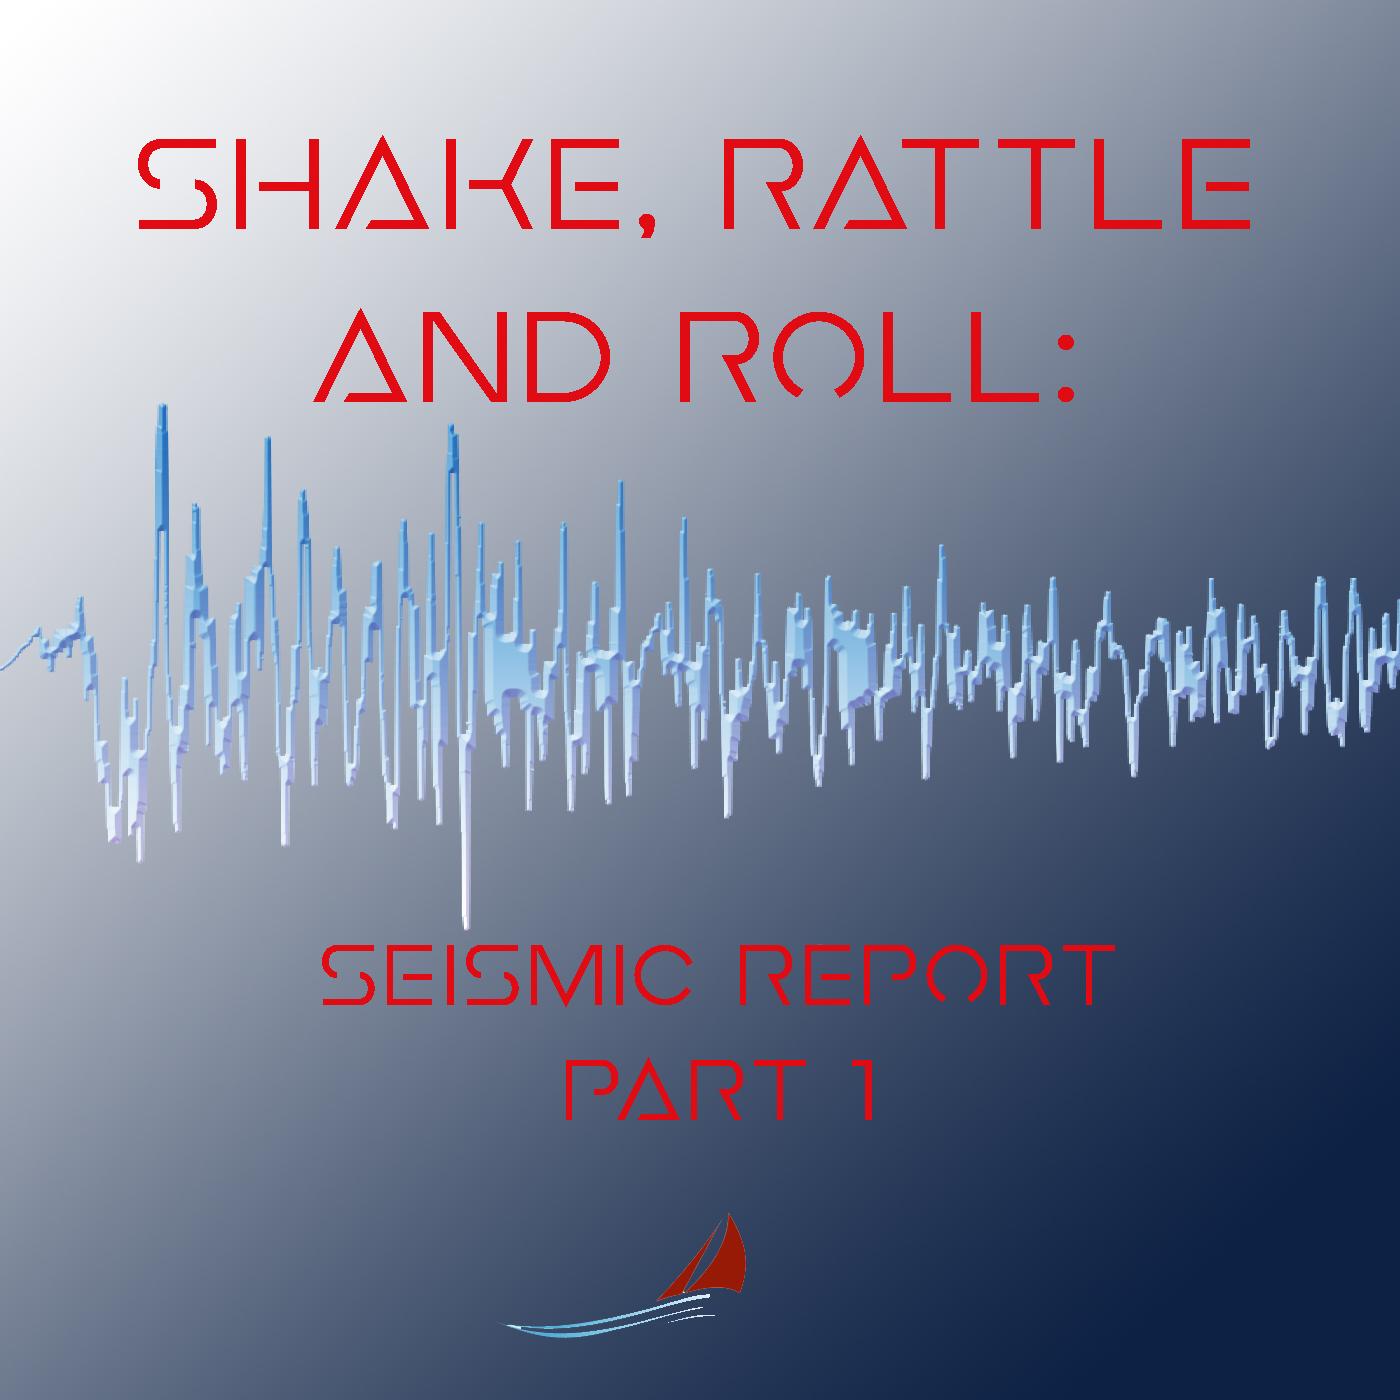 shake_rattle_roll-1.jpg